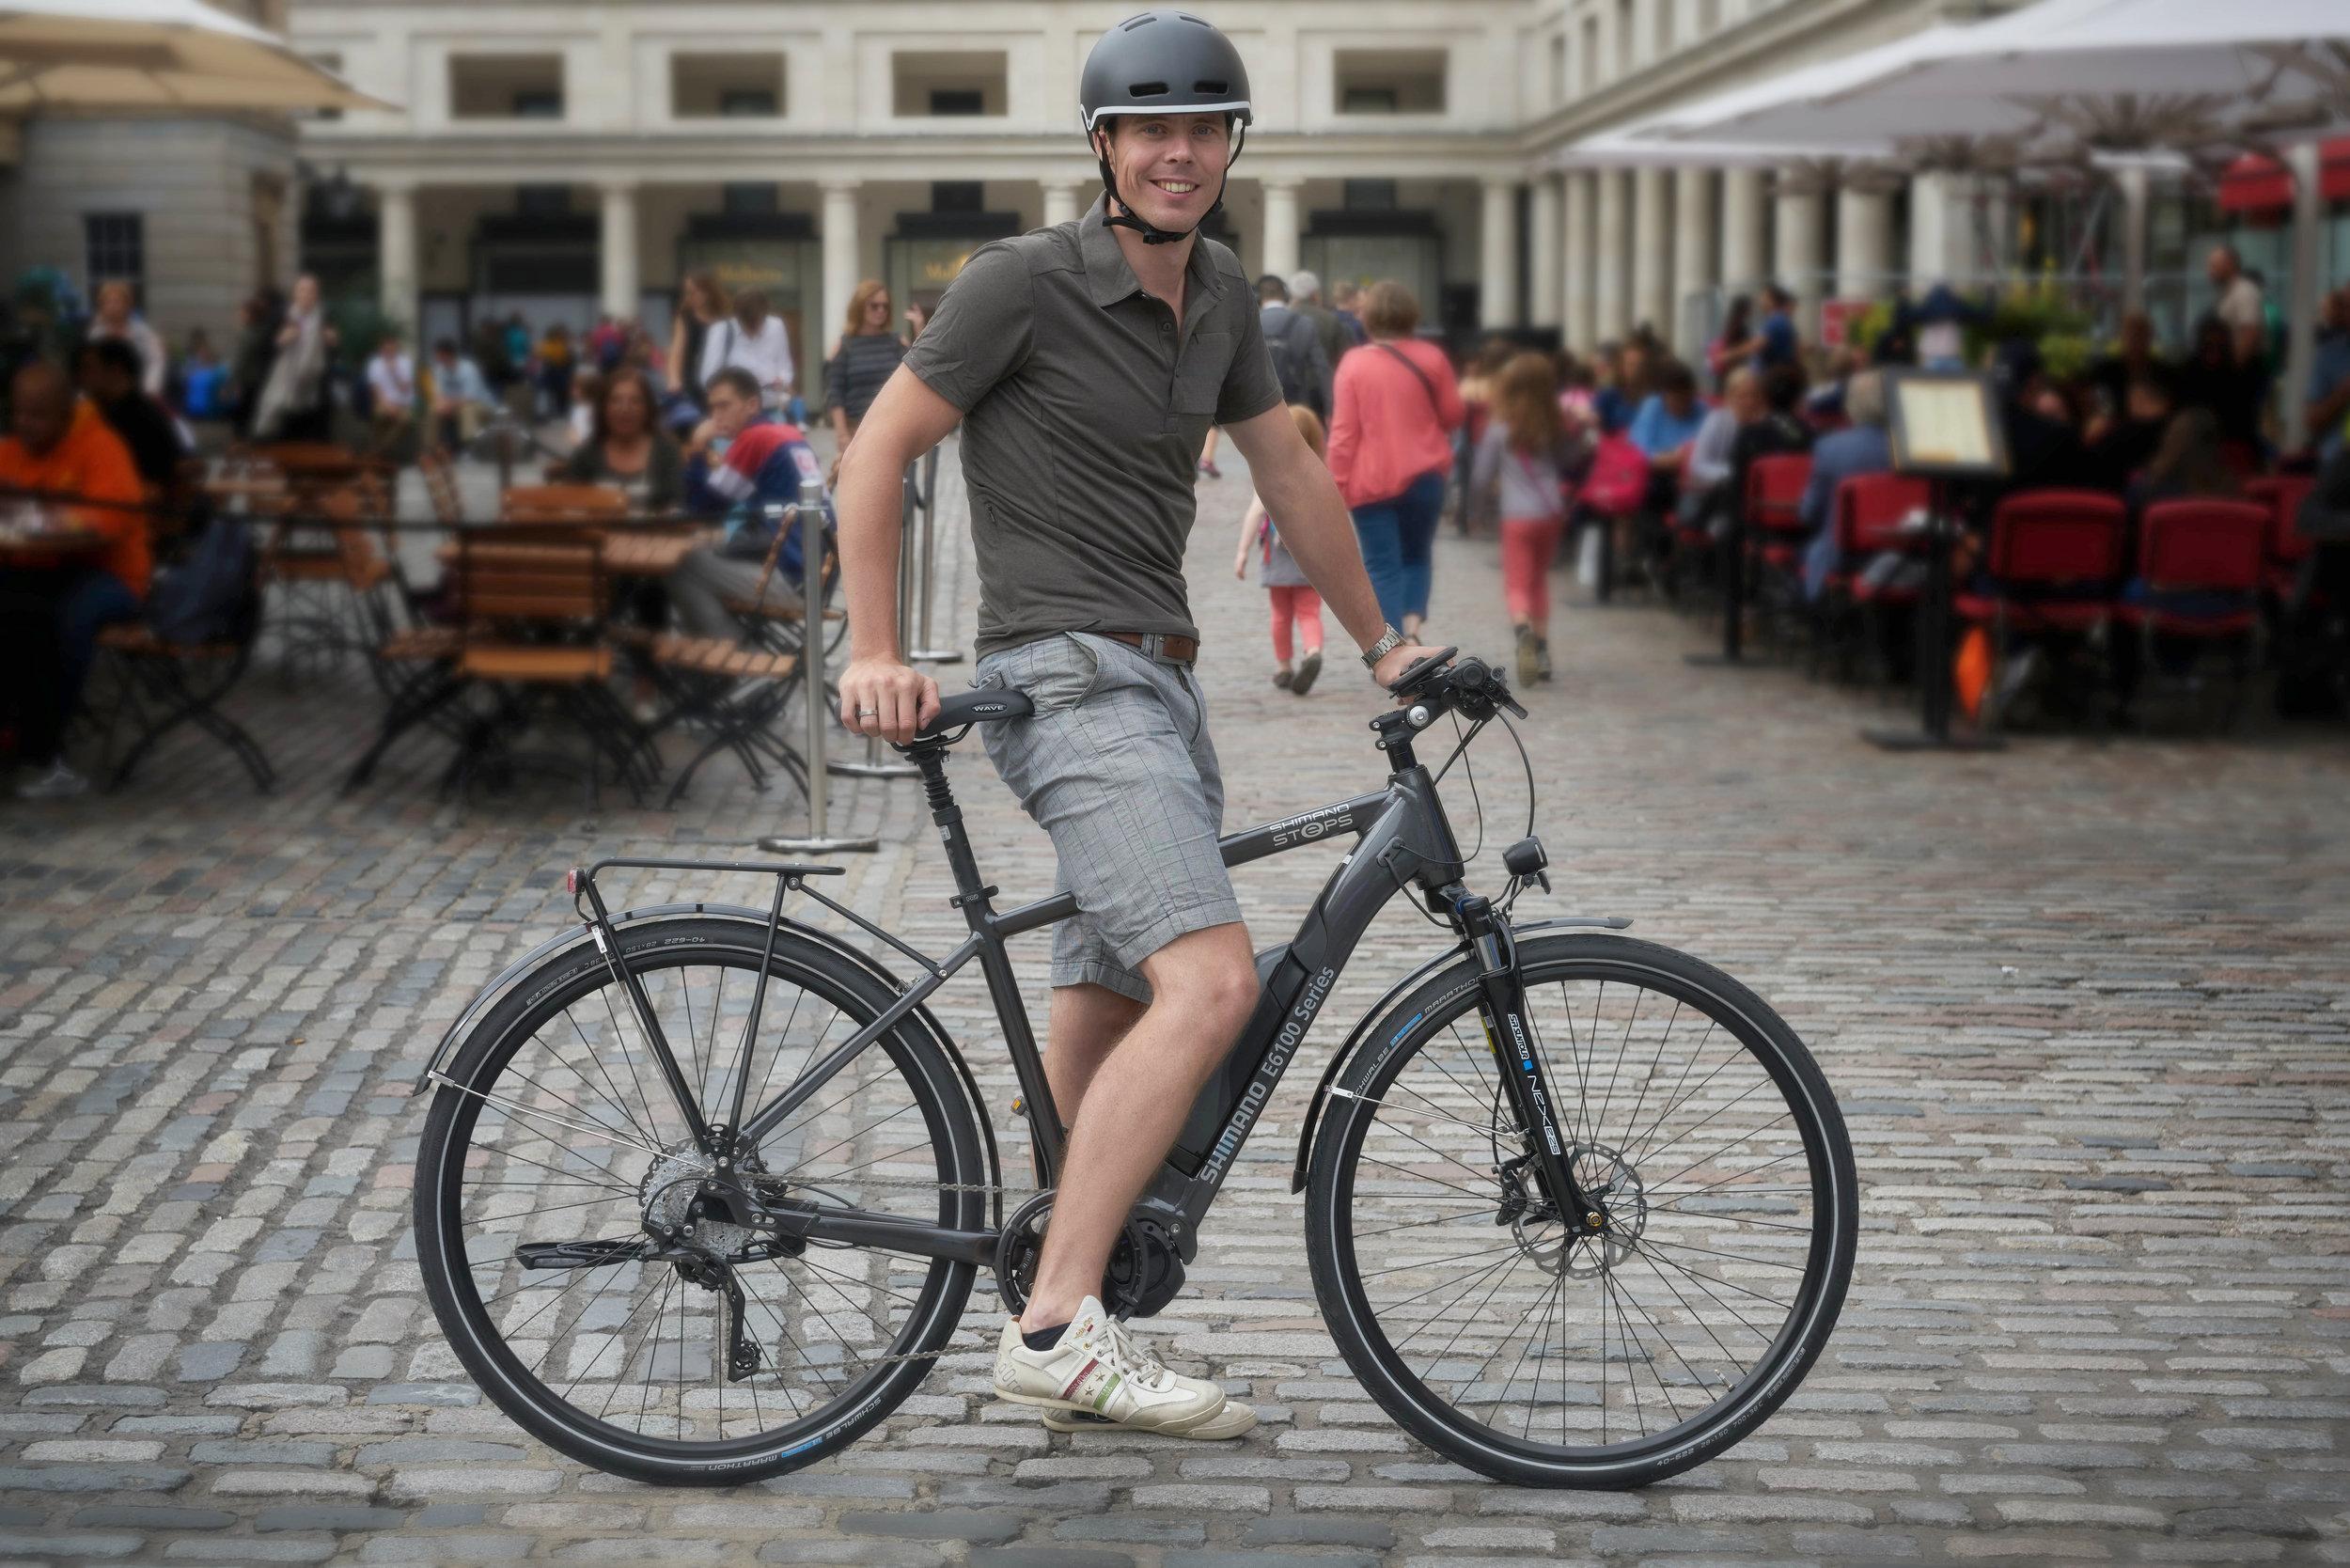 shimano electric bike day 2_34.jpg